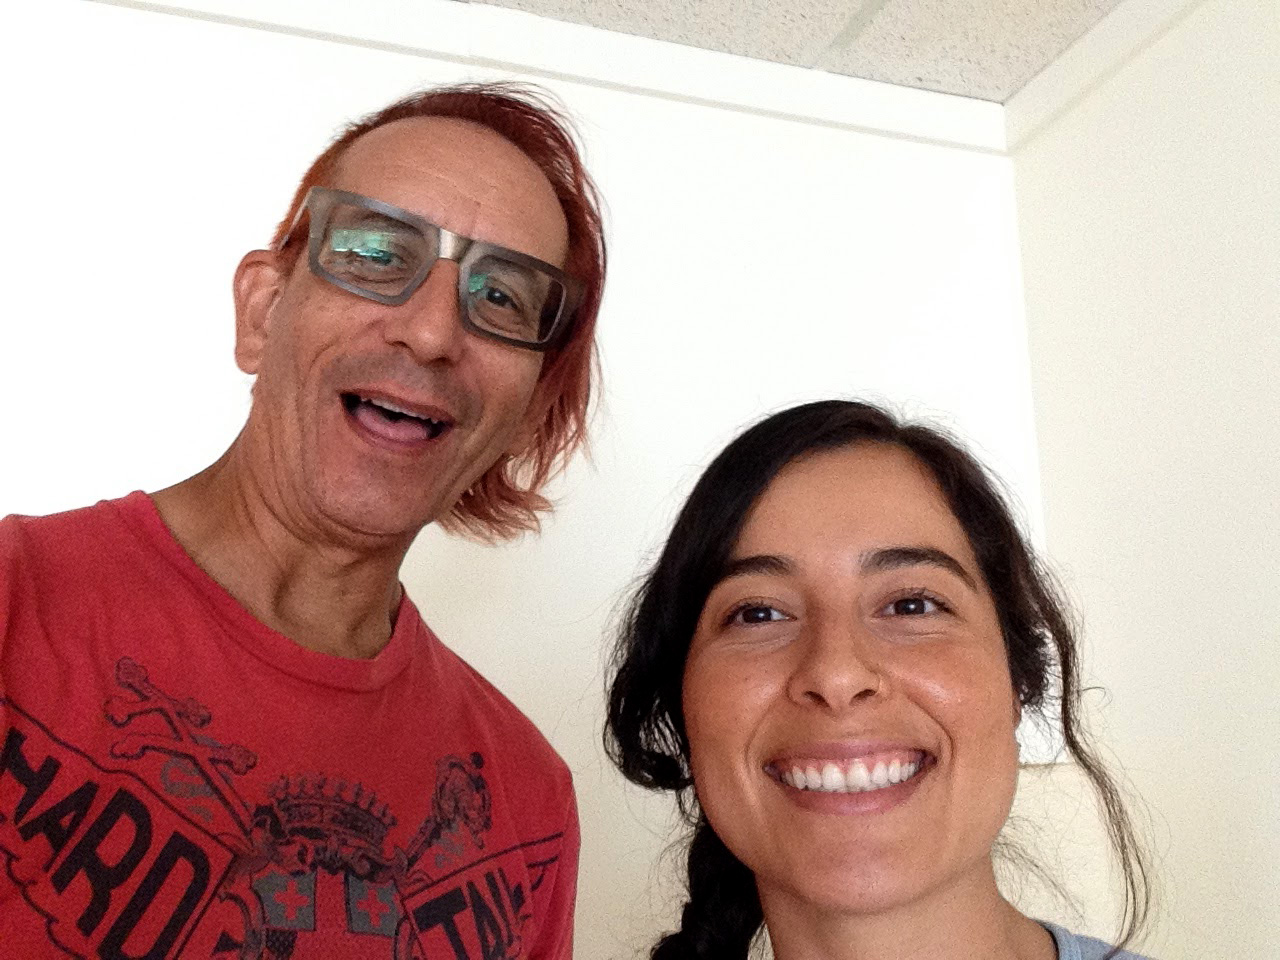 photo of Glenn Zucman & Jocelyn Ramirez at People's Yoga in East Los Angeles, California